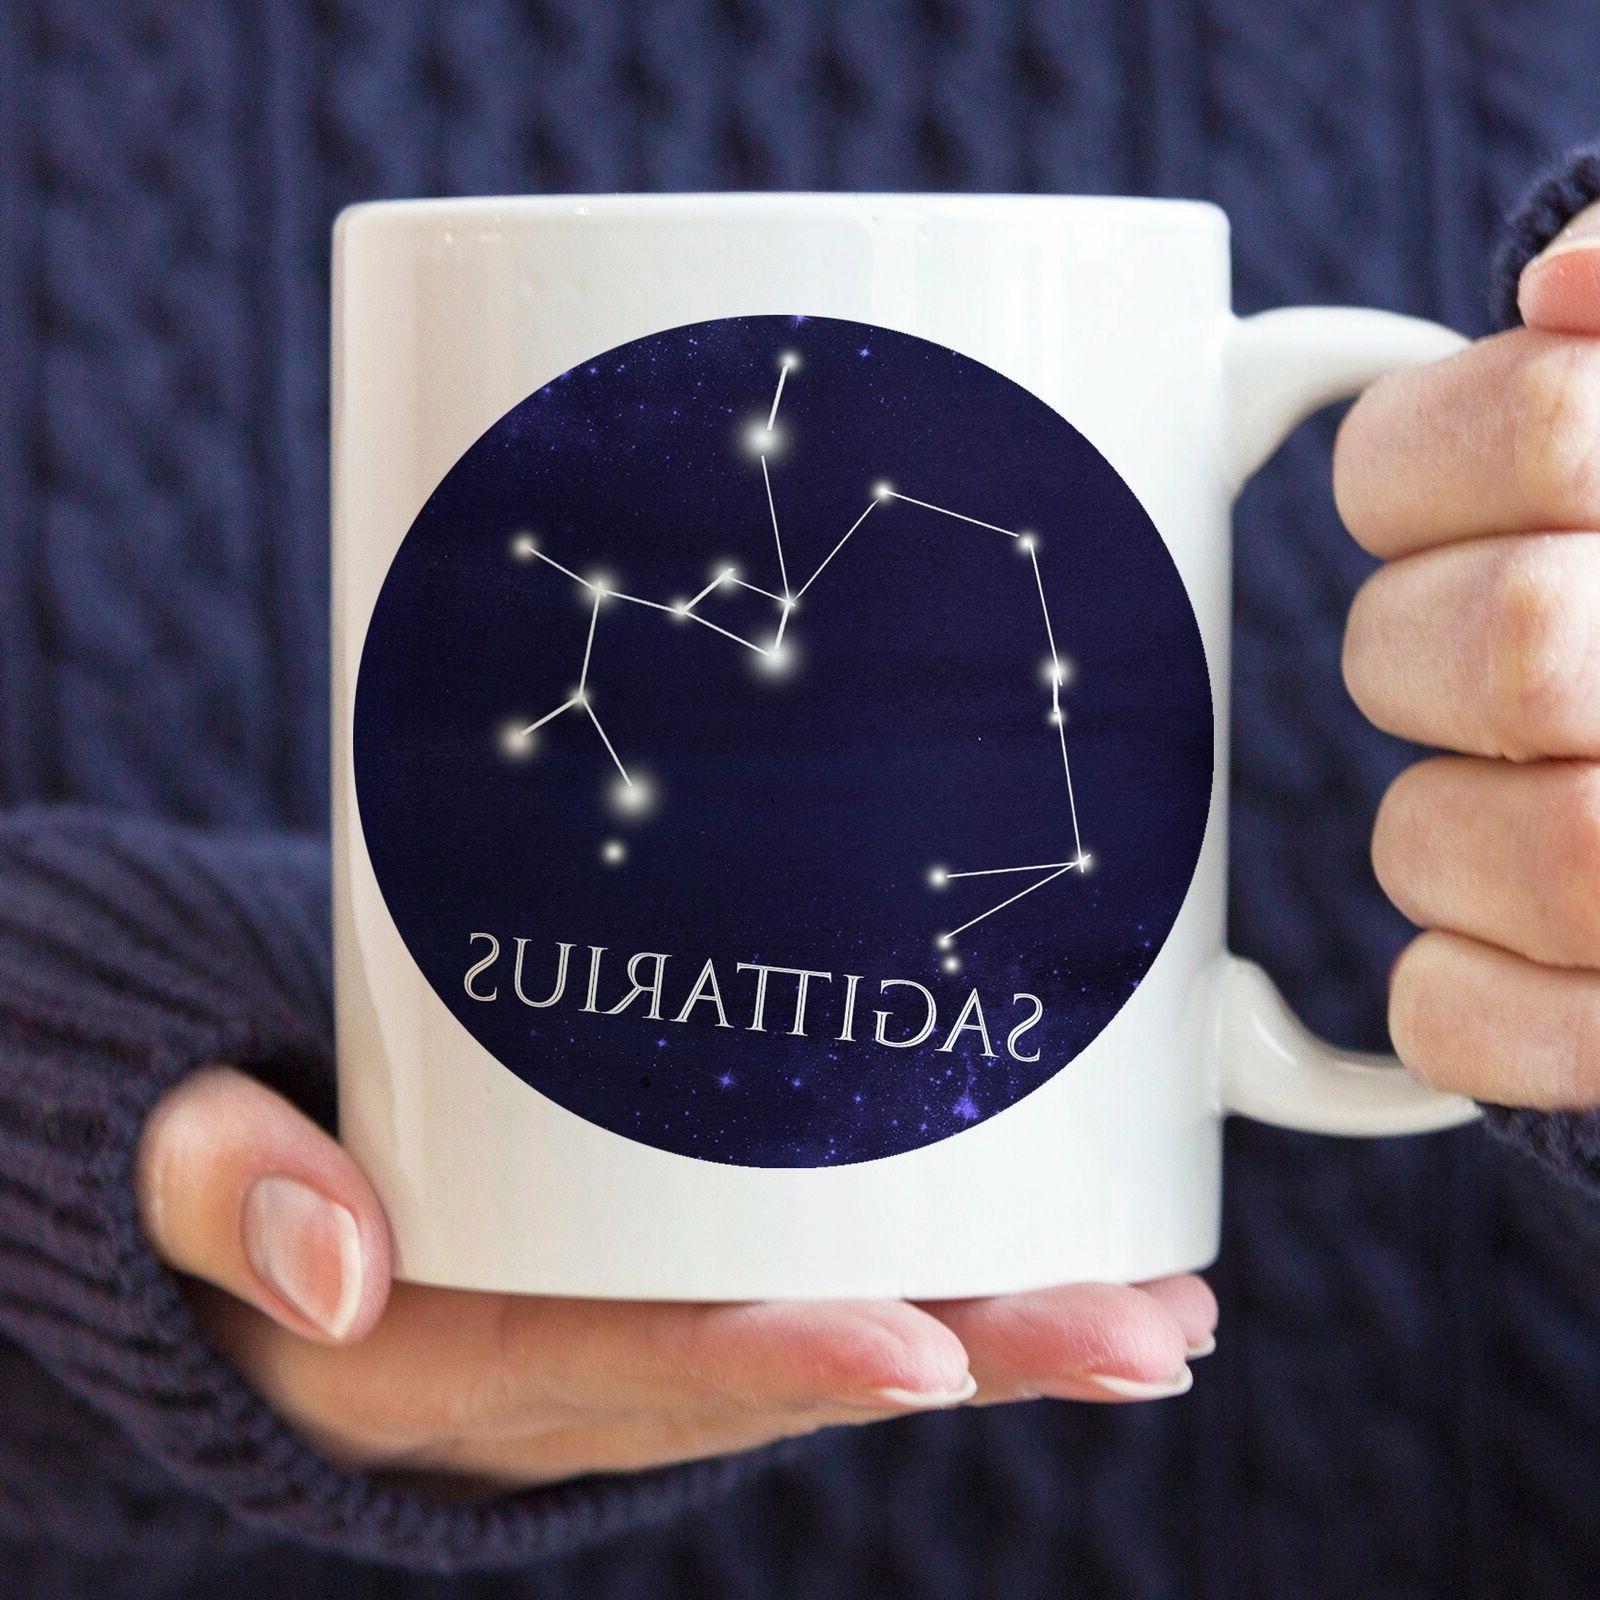 celestial sagittarius constellation coffee mug microwave